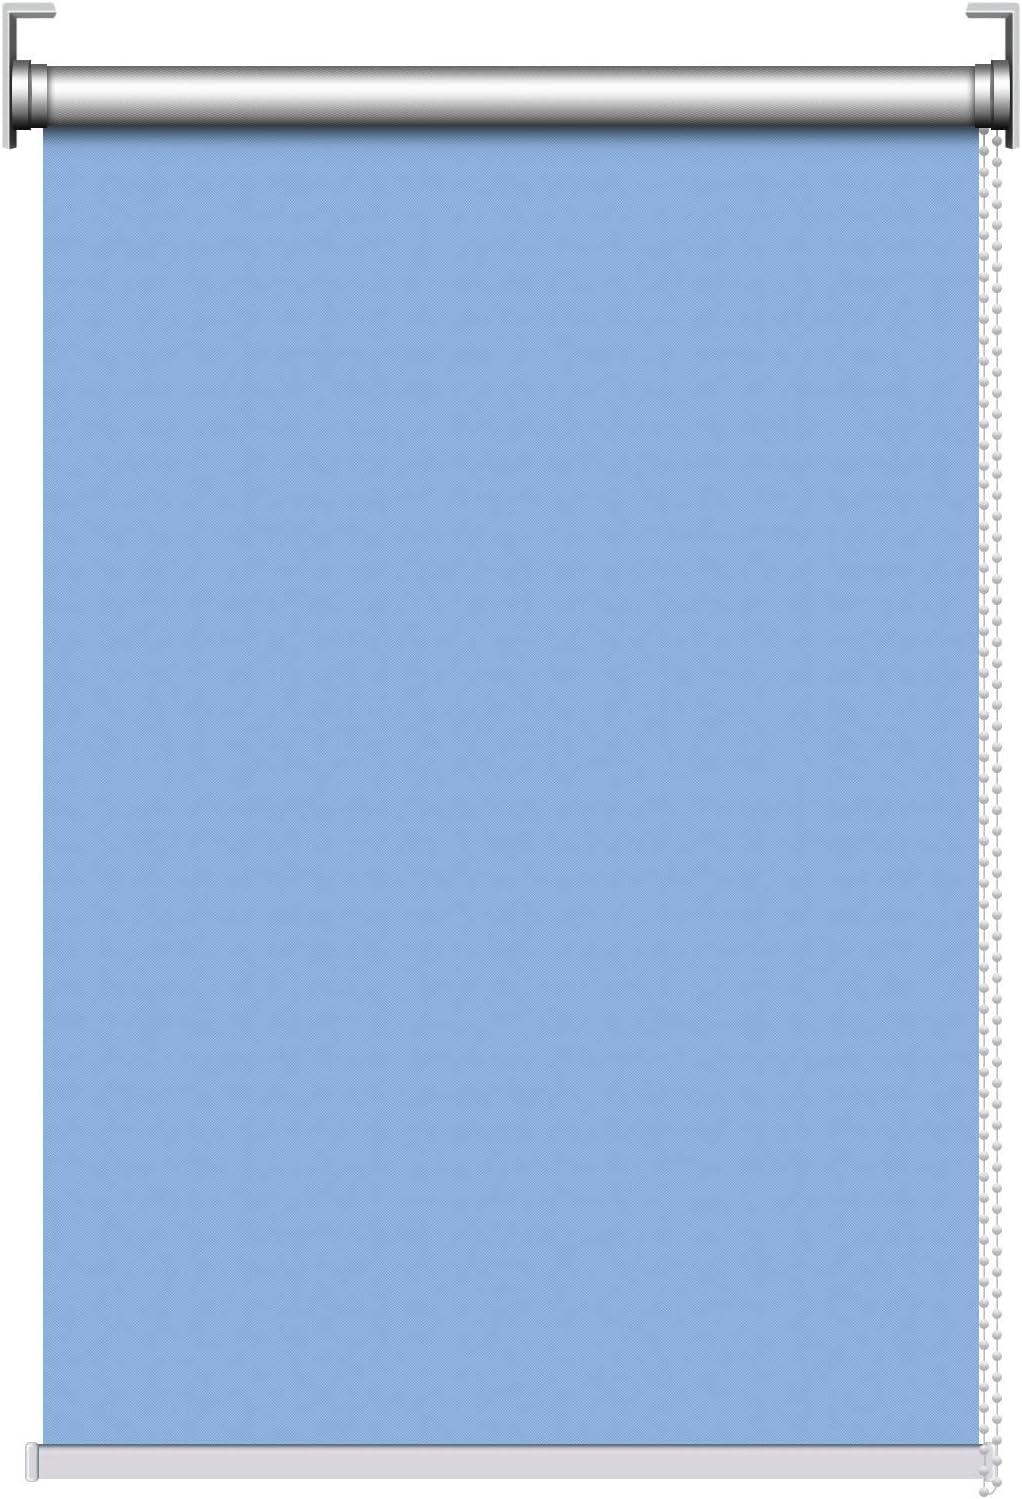 Foreate Blackout Roller Window Ro Waterproof List price Shades Financial sales sale Blind